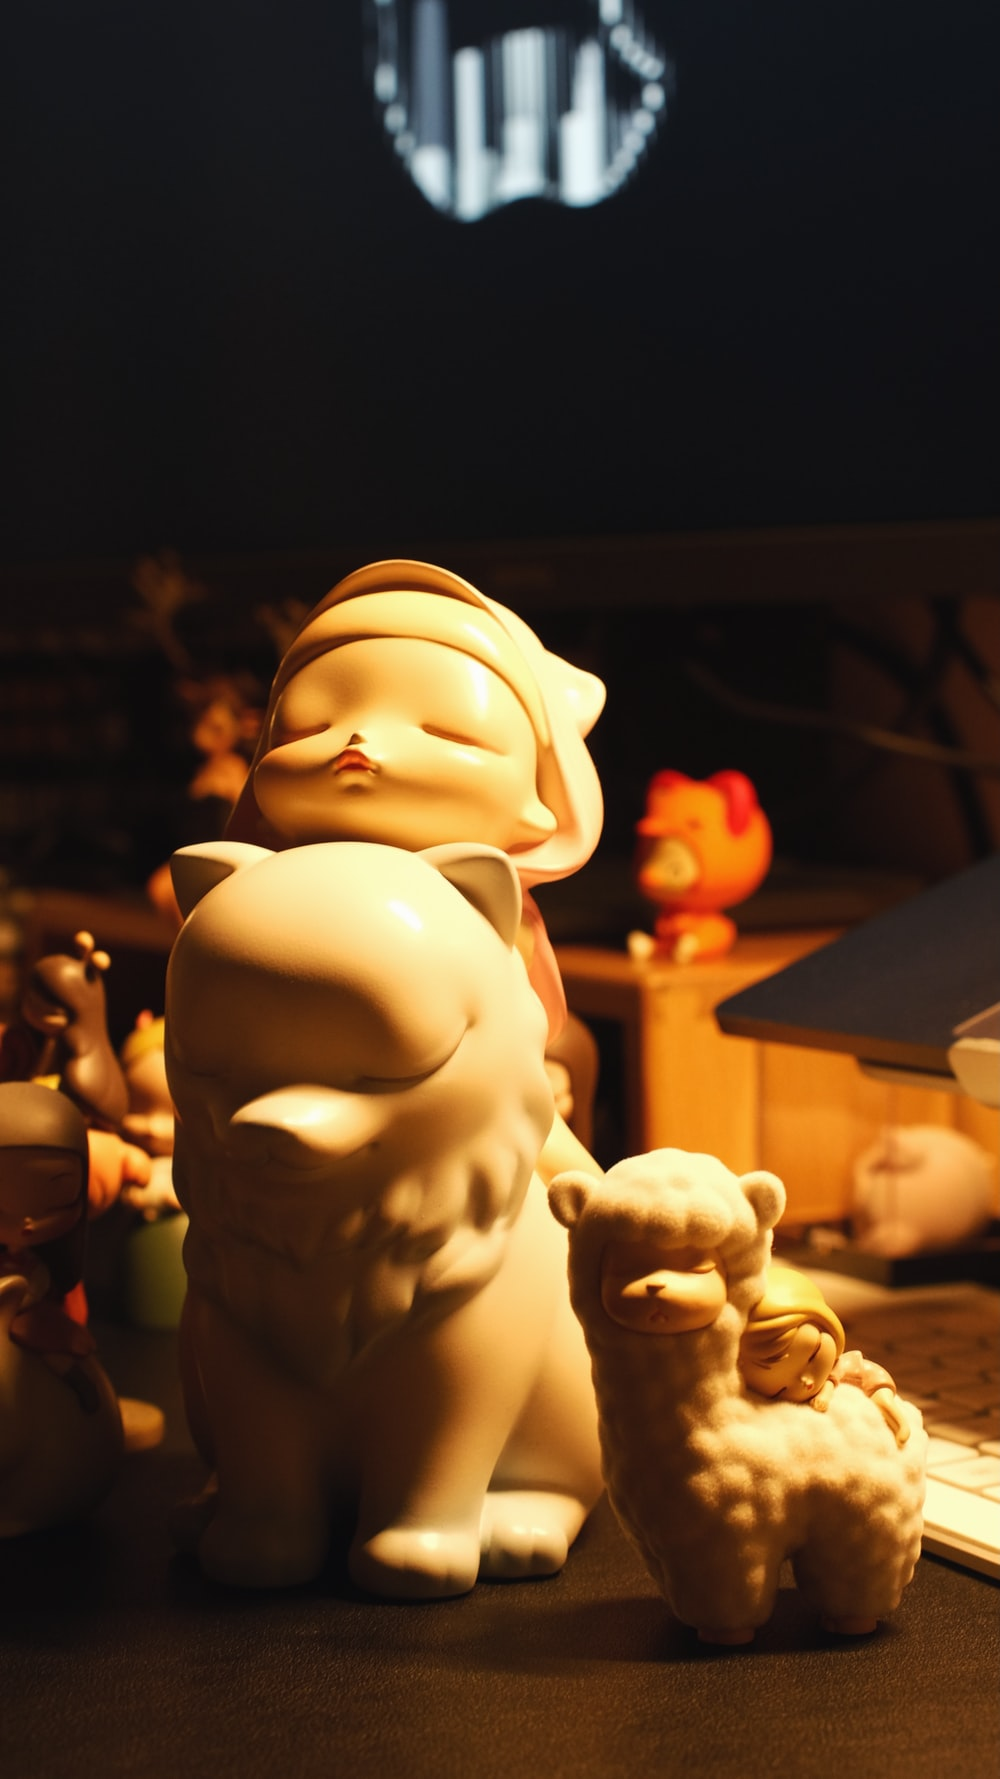 white ceramic figurine of man and woman